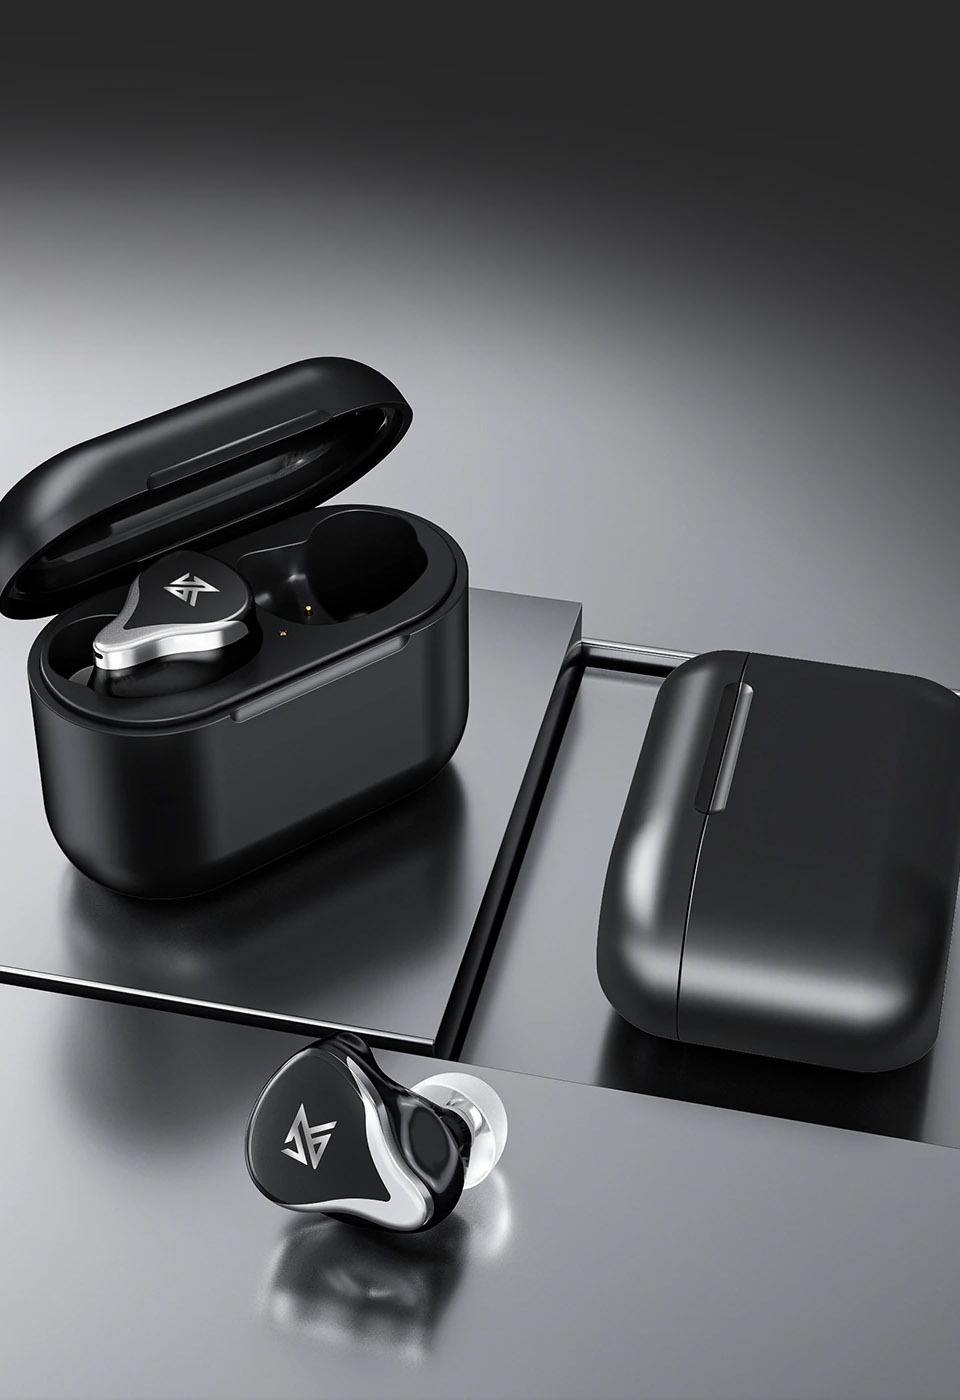 KZ Z3 4-unit hybrid technology TWS earphone